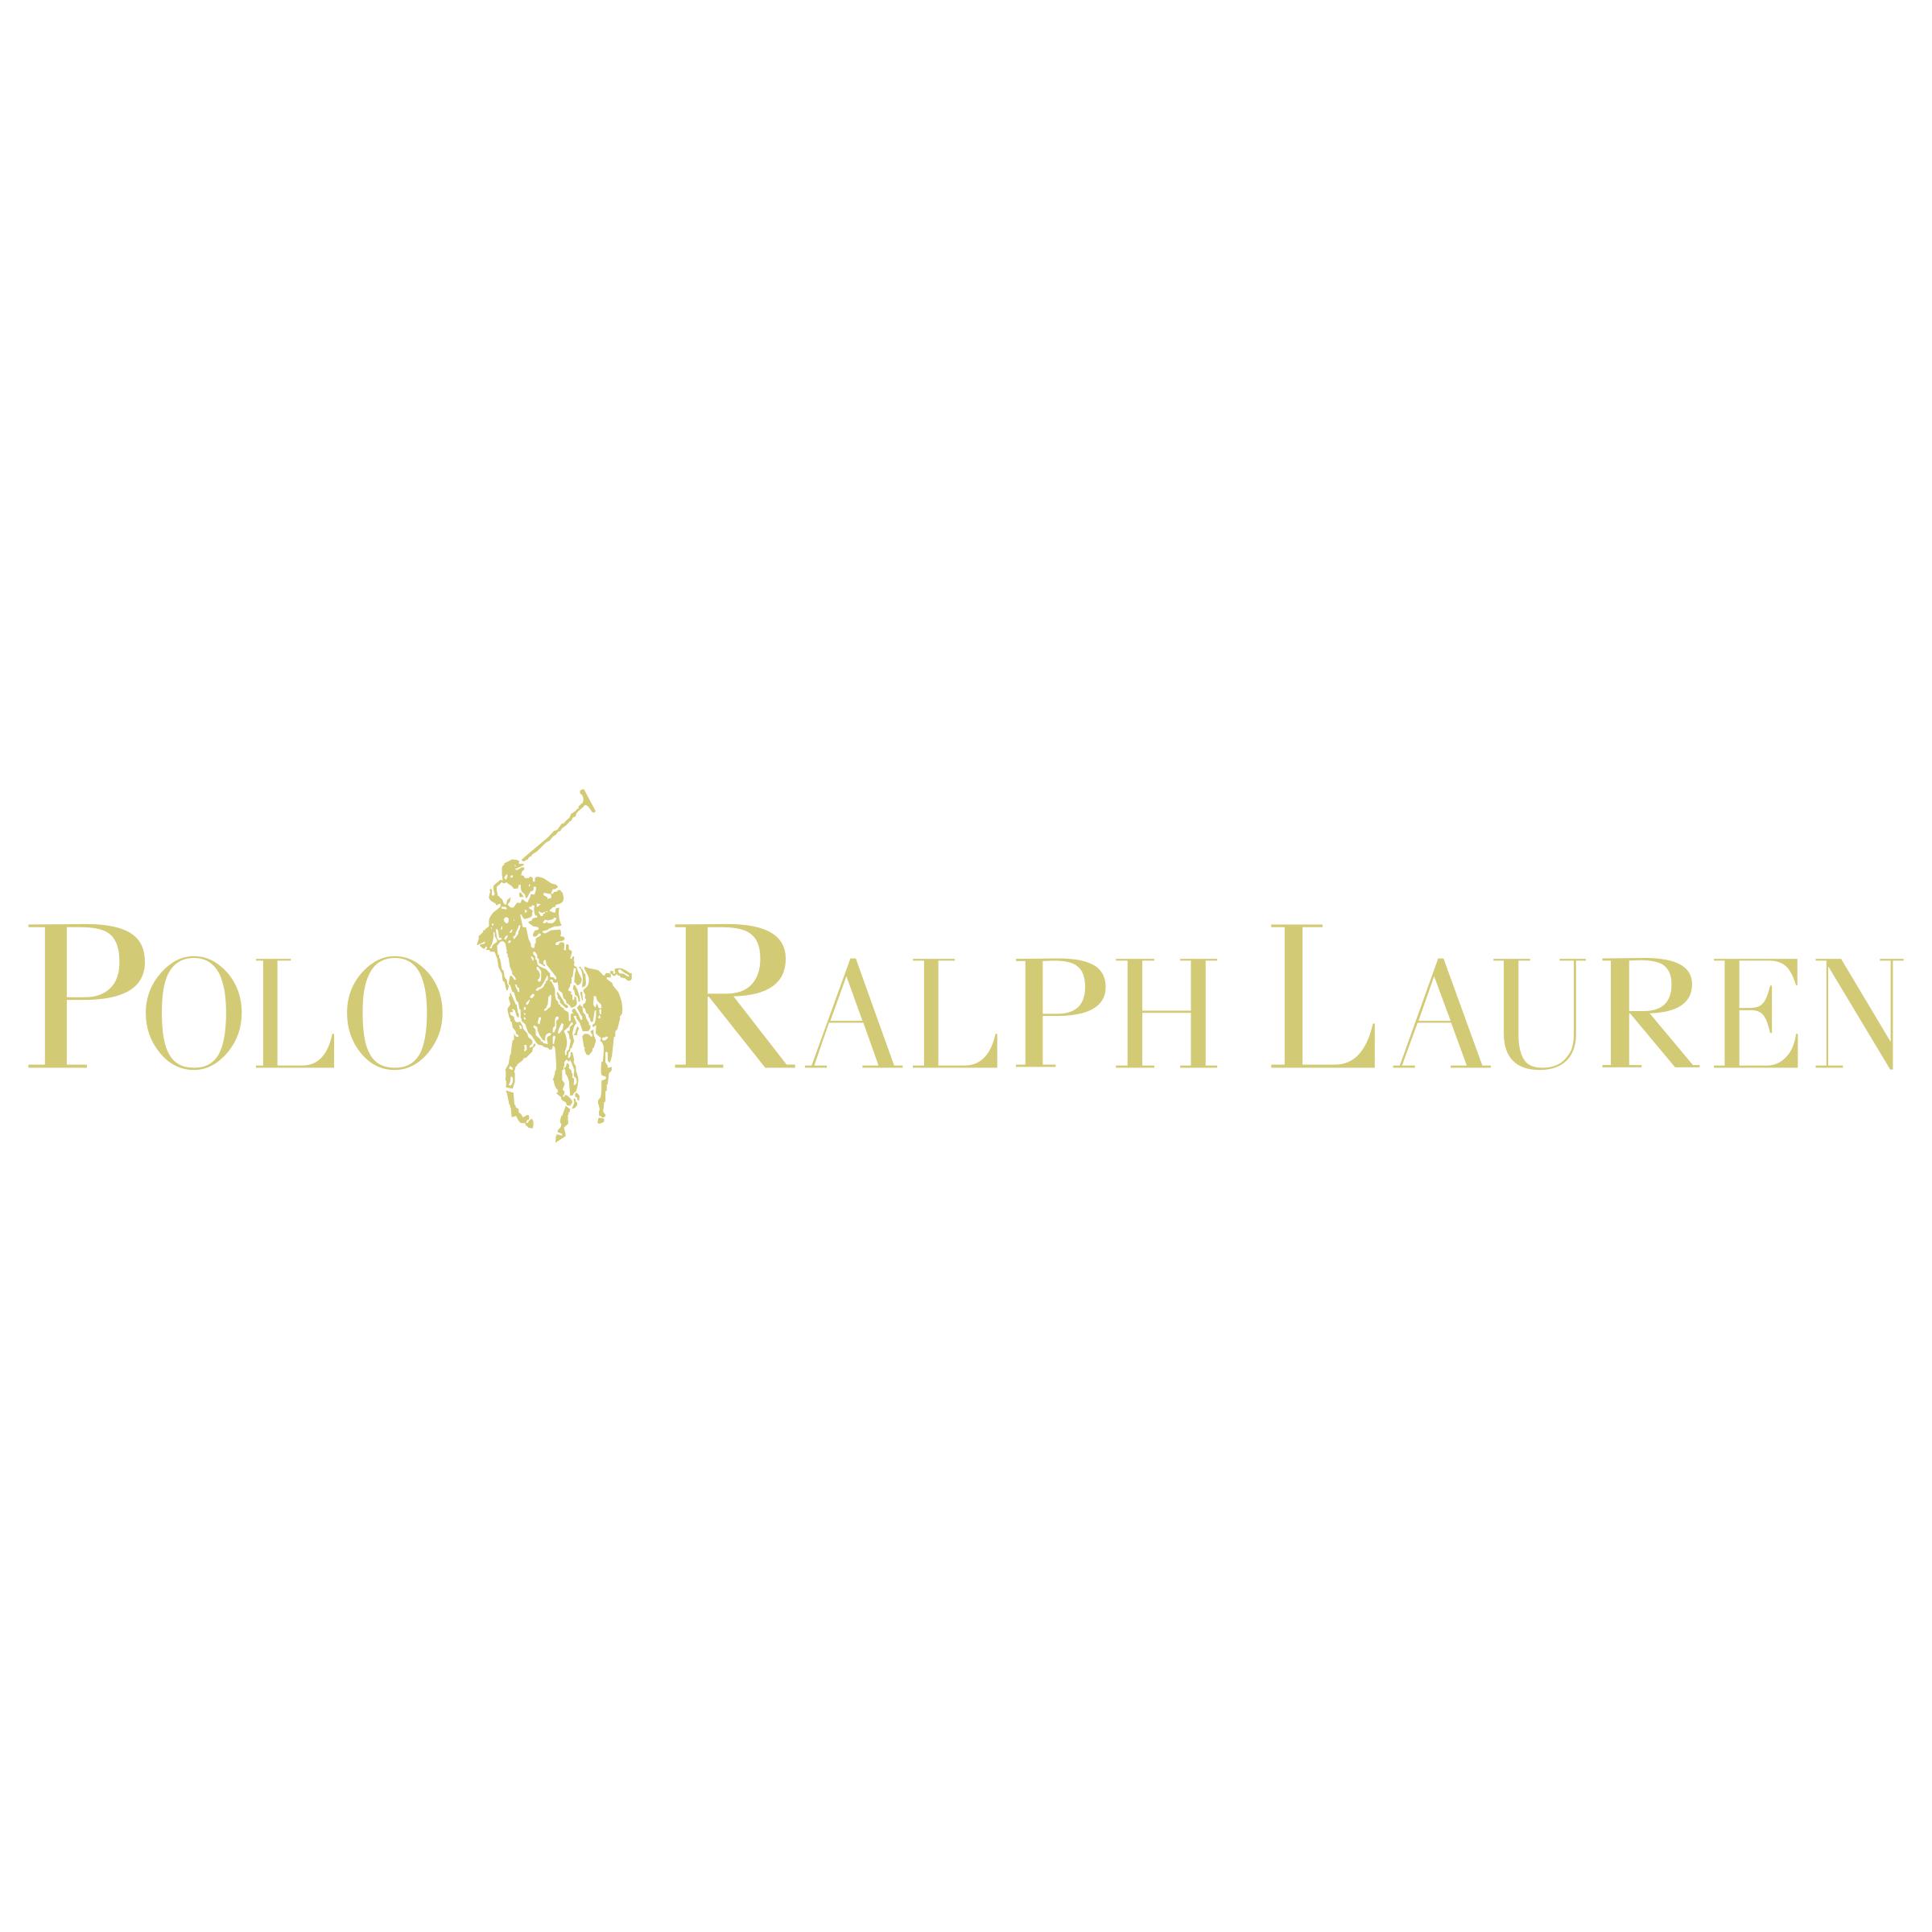 Polo Ralph Lauren Logo Png Transparent Svg Vector Freebie Supply